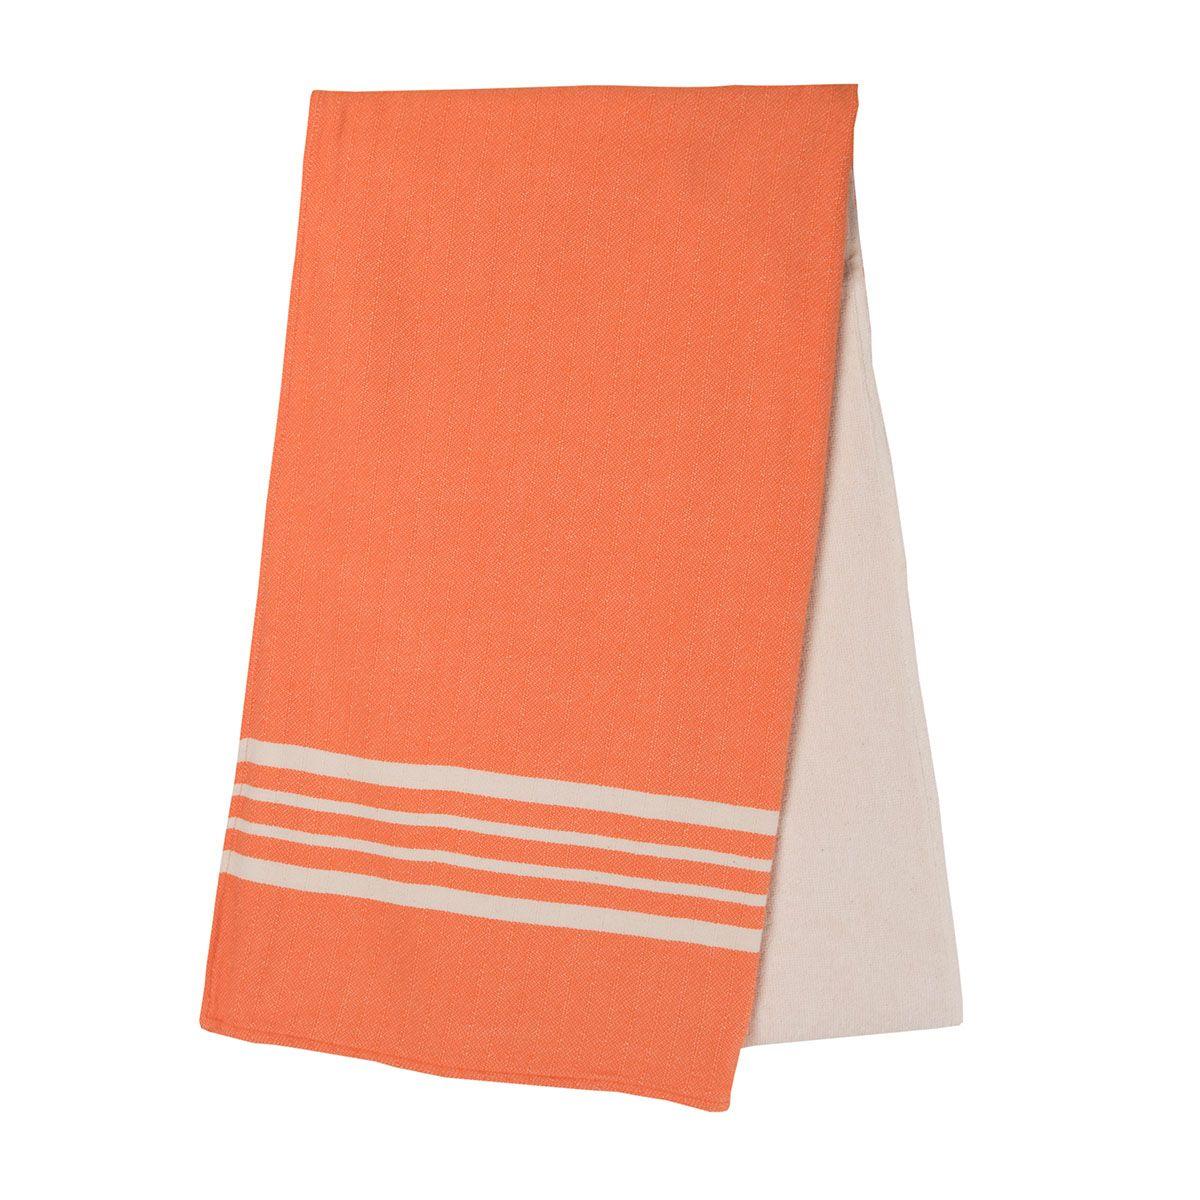 Peshtowel Sultan - Orange